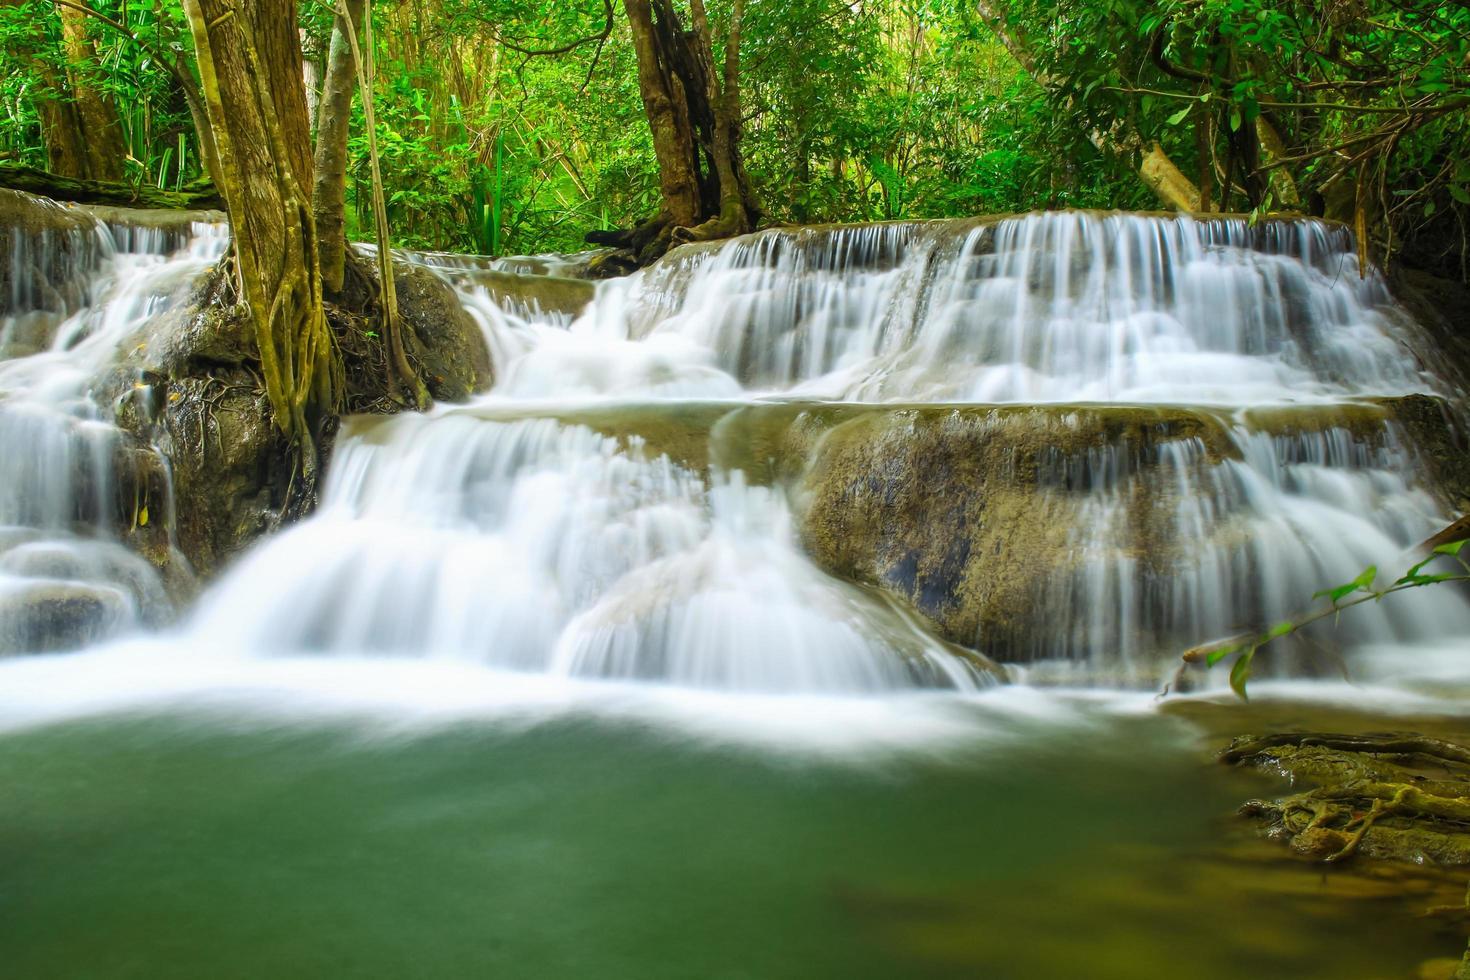 huai mae khamin cascade dans une forêt photo